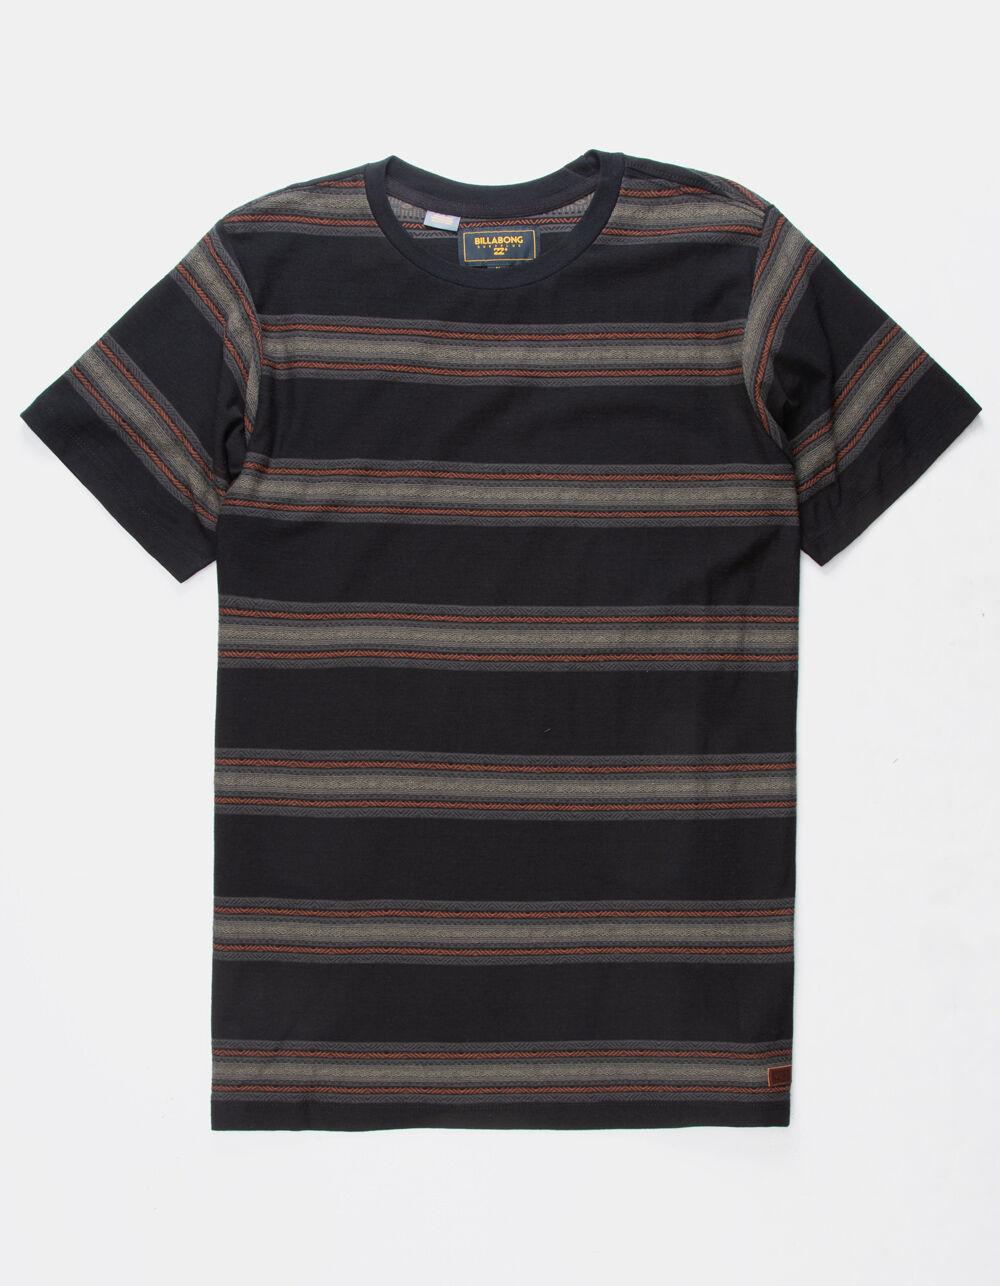 BILLABONG Chico Stripe T-Shirt